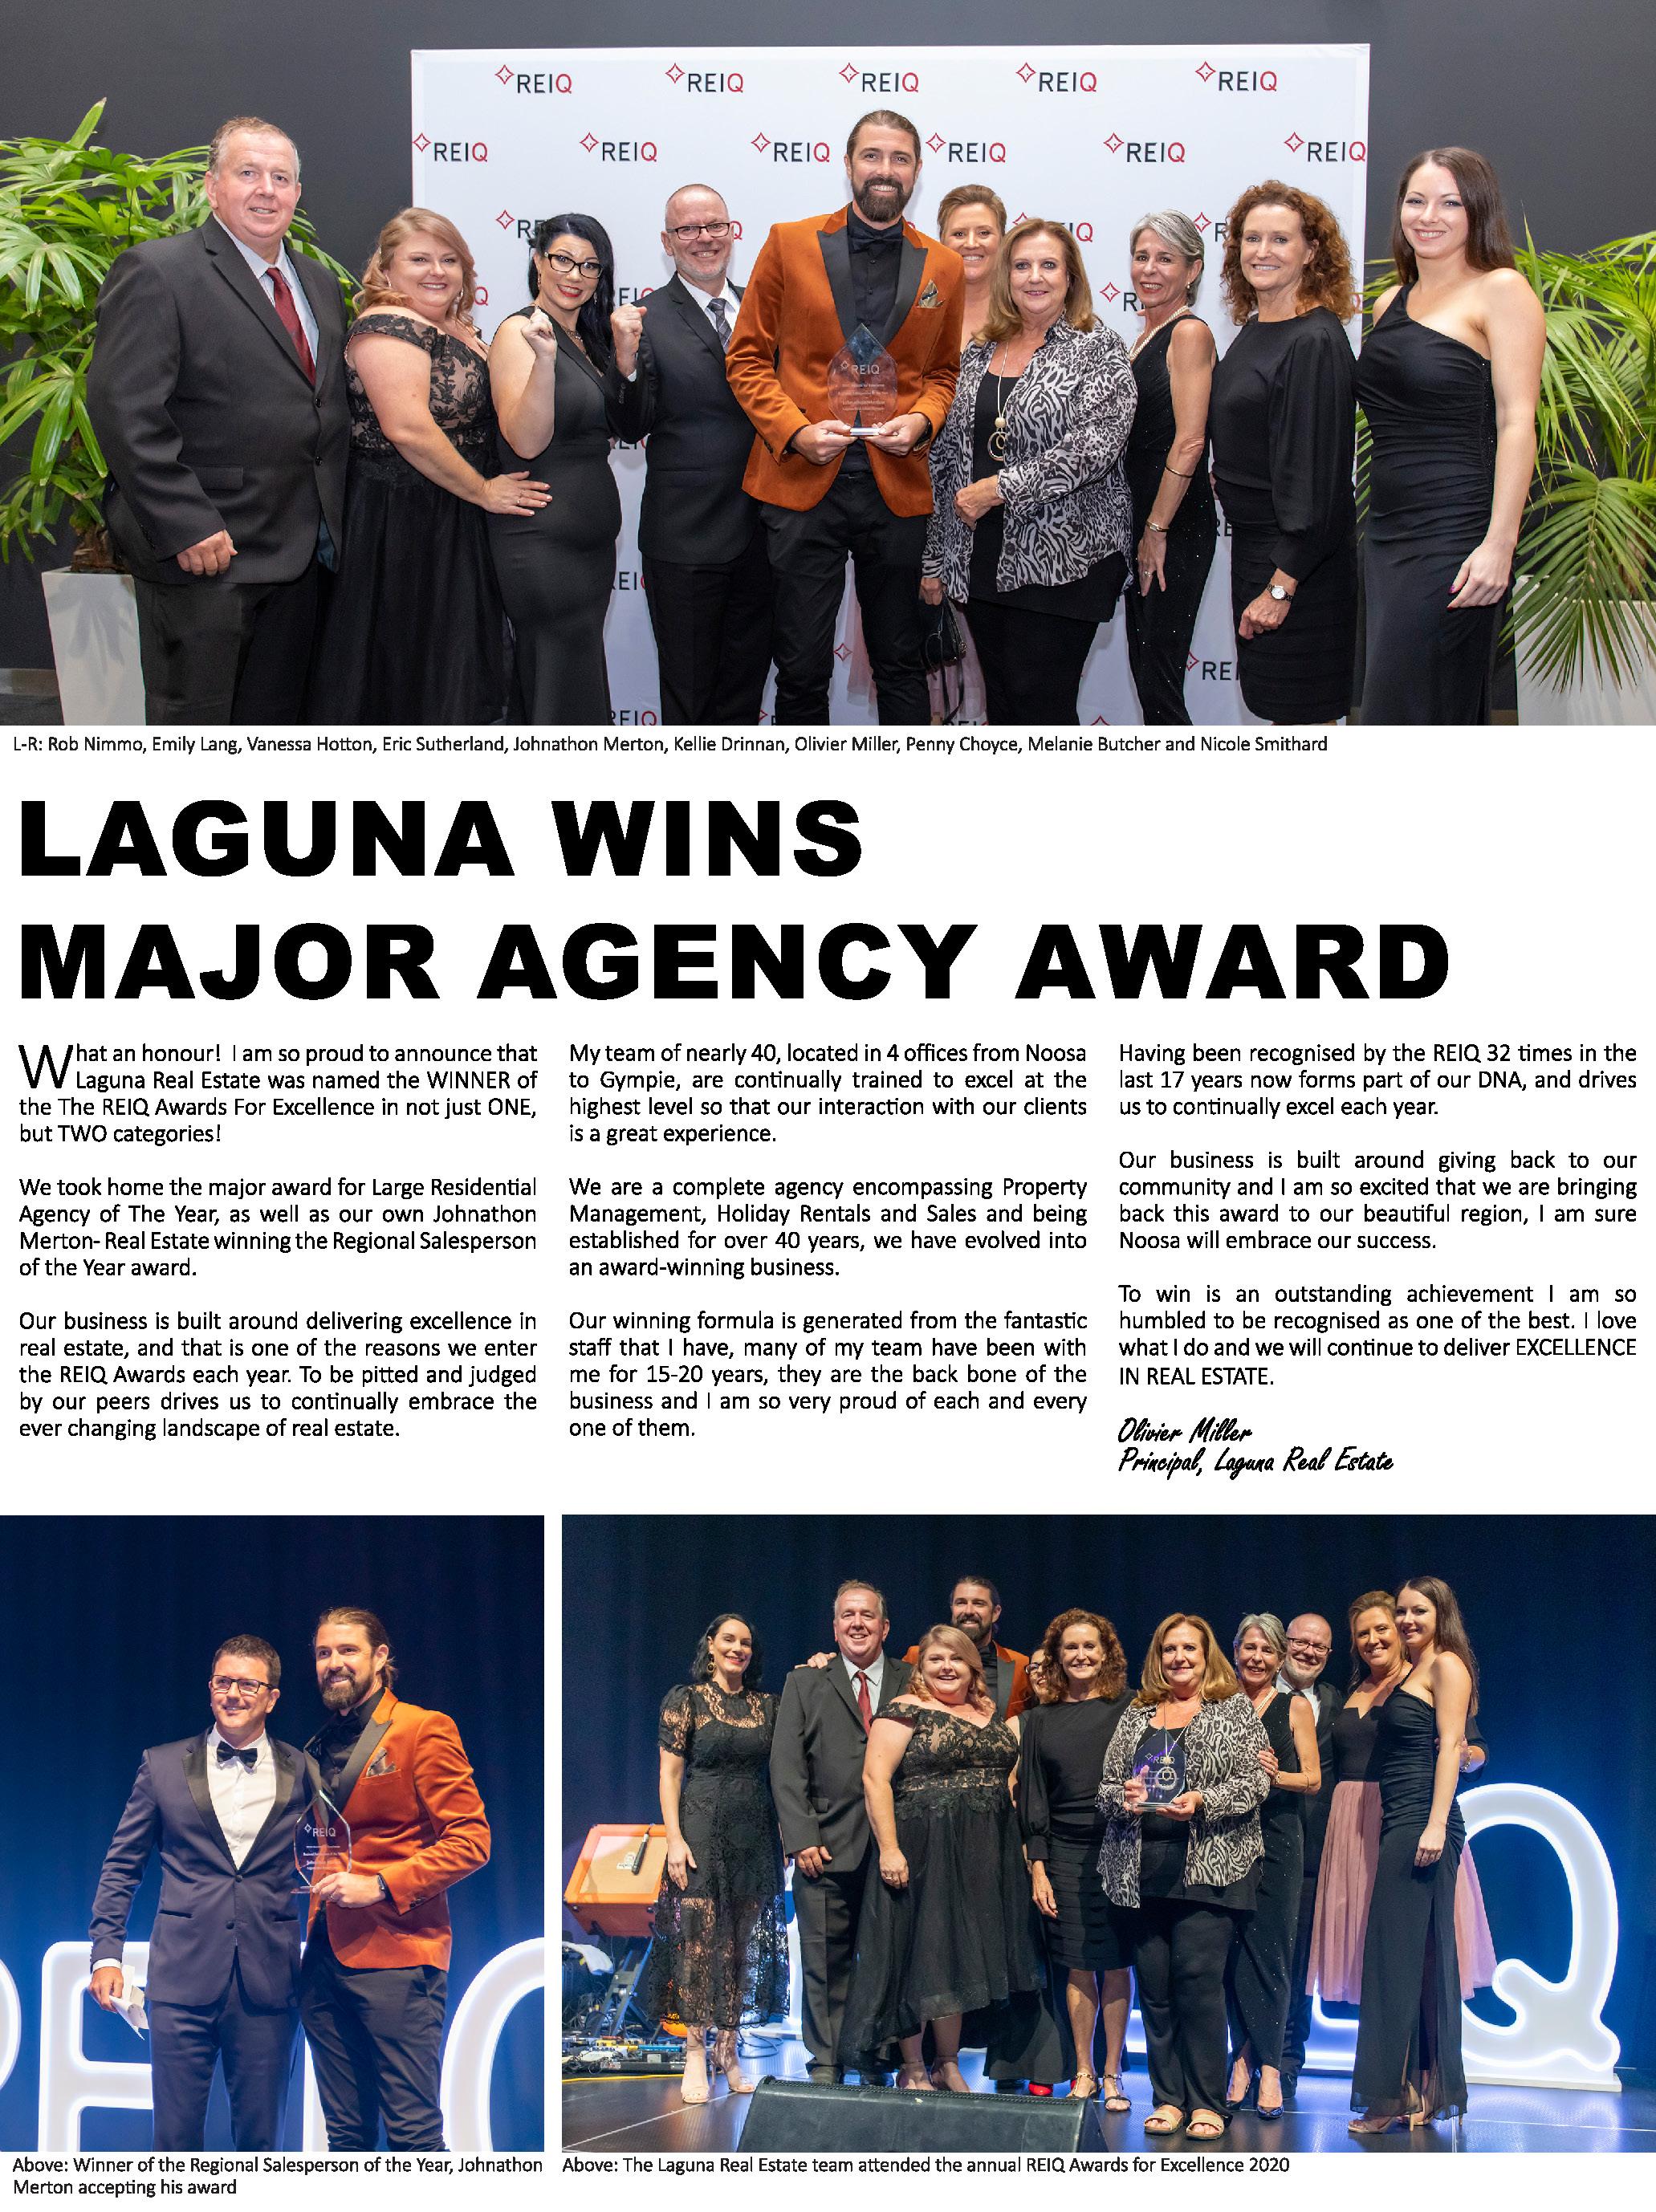 https://assets.boxdice.com.au/laguna/attachments/223/f9b/reiq_awards_promo_tuesday_240320_headers.jpg?5fb41e2a0750e13e9311aec0ccd5b4b9